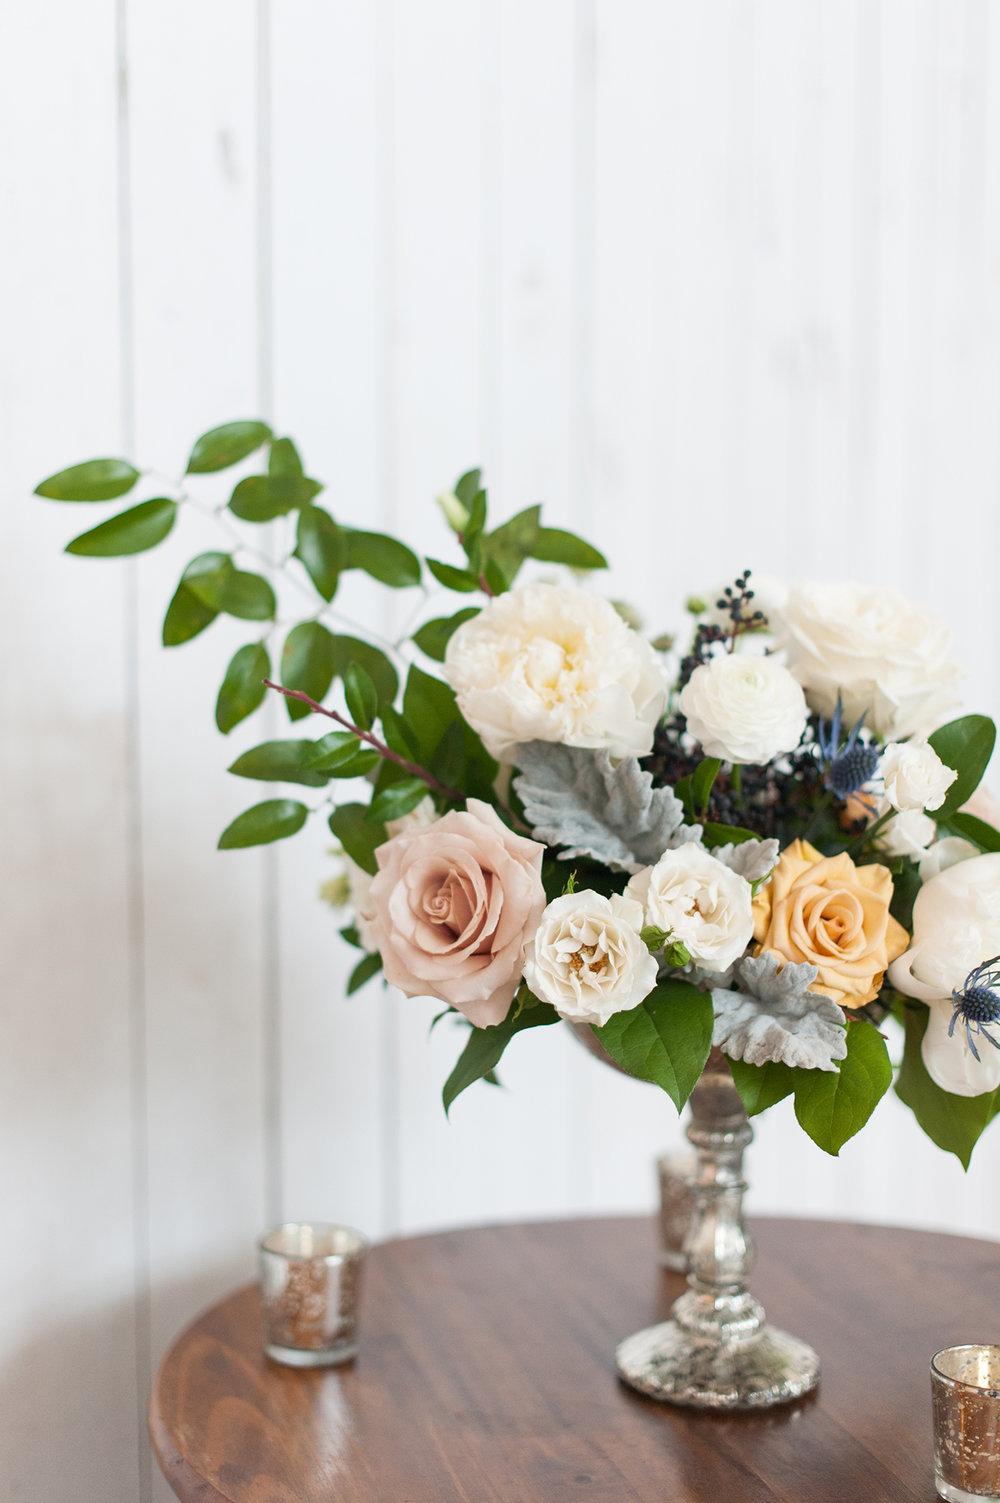 White Sparrow Floral Design - Olive Grove Design - 00332.jpg